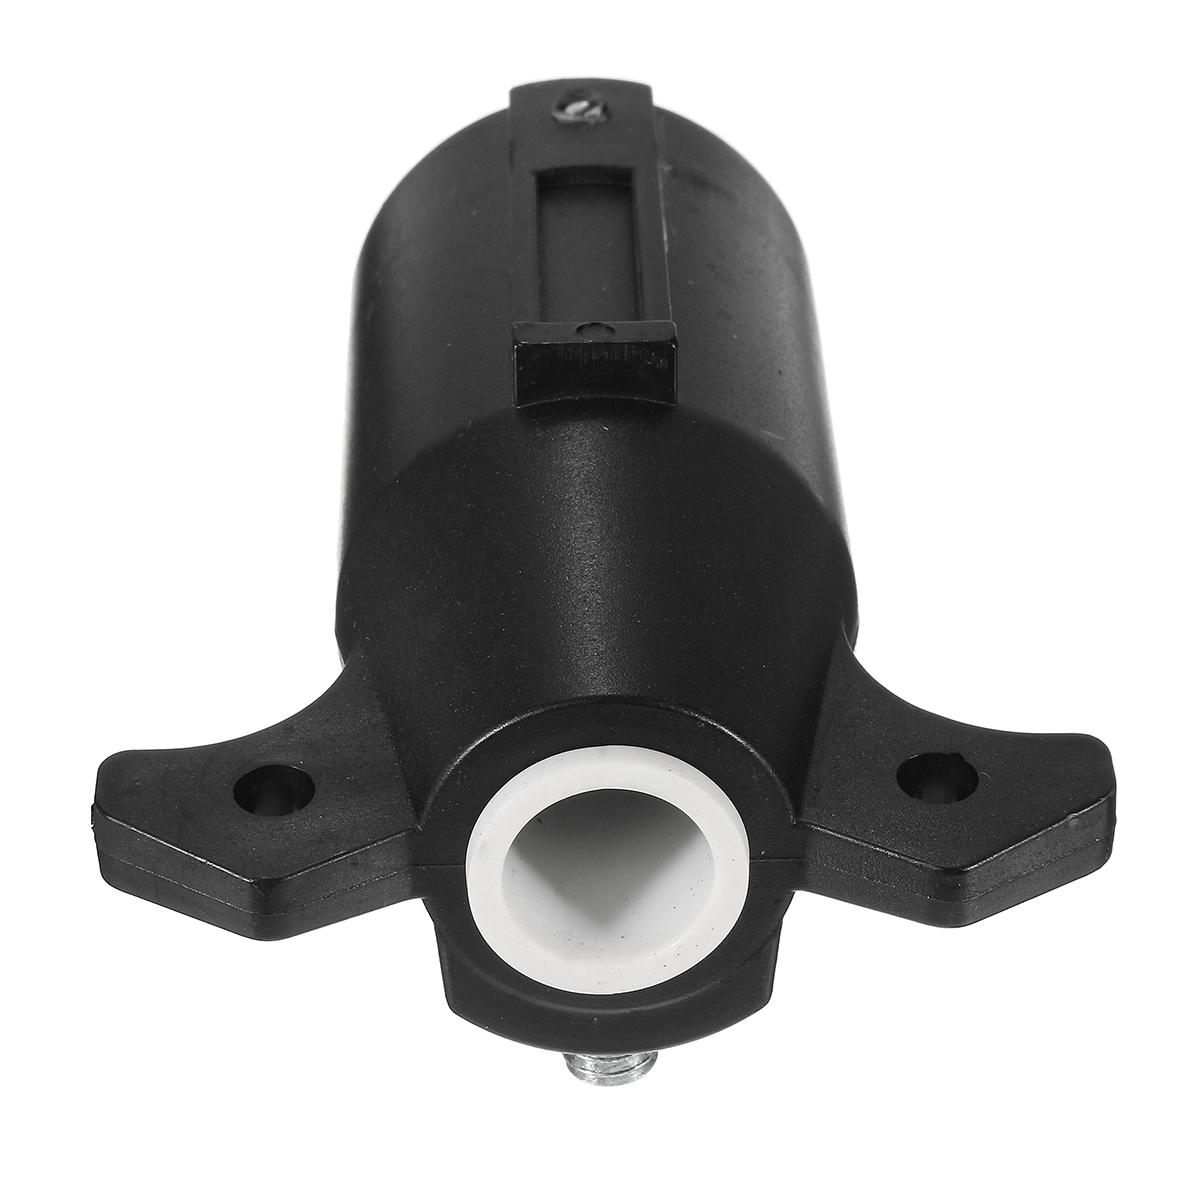 trailer connector l14 30p wiring diagram black round 7 poles rv male light plug